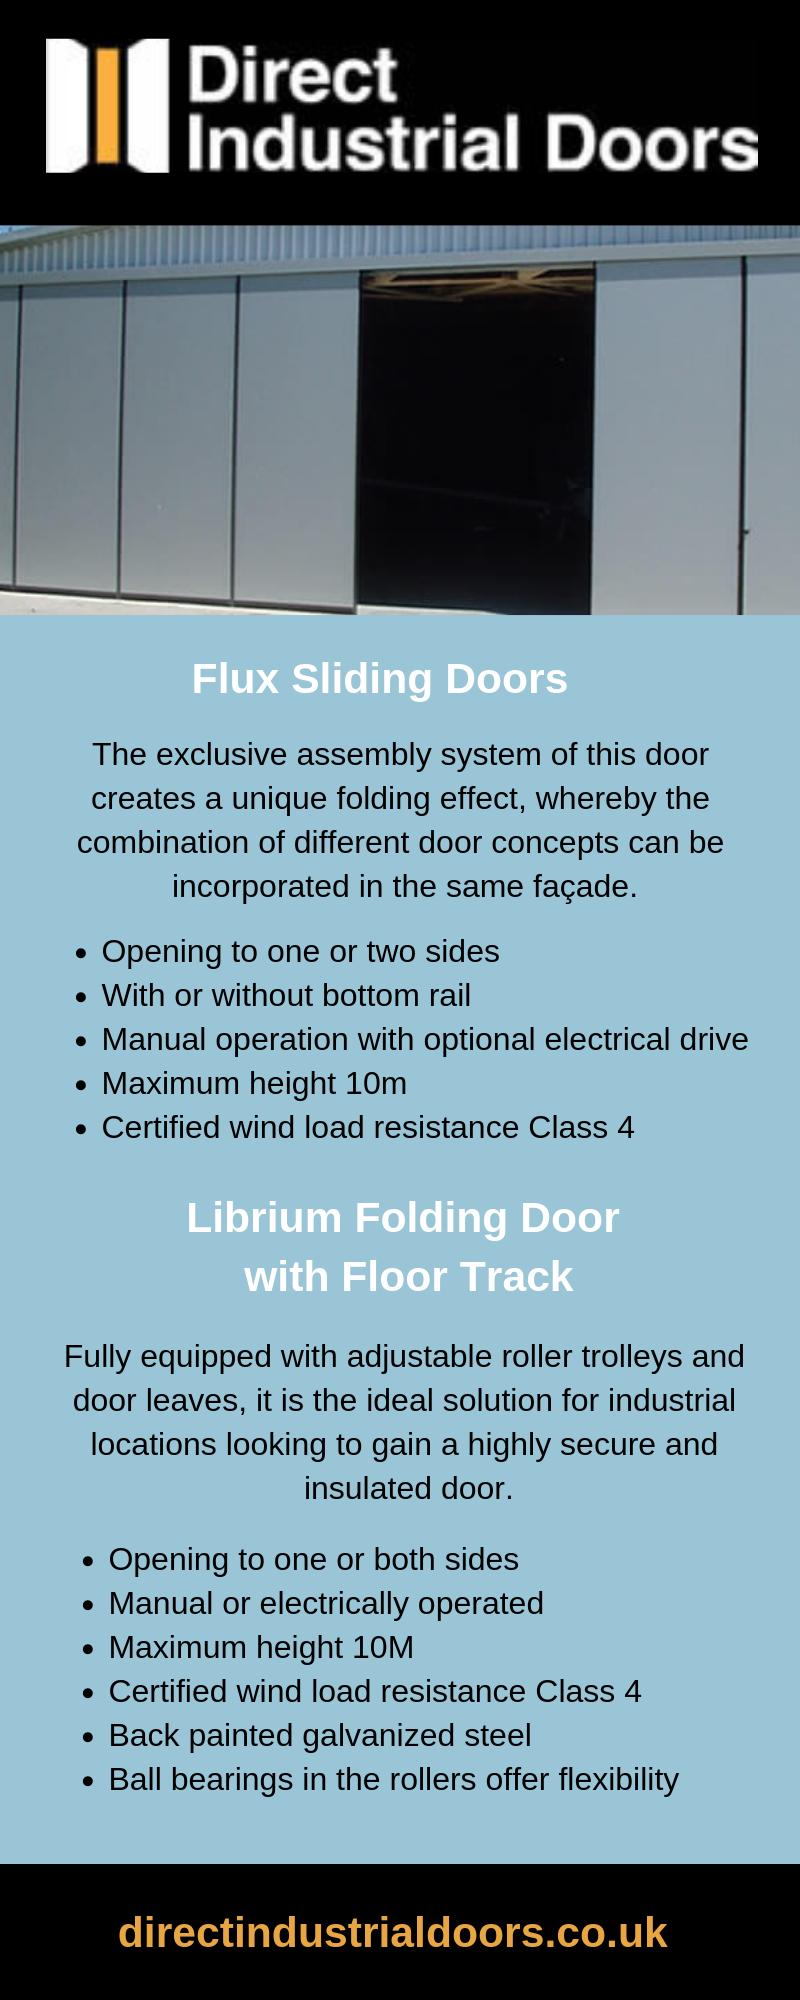 What Are Flux Sliding Doors?